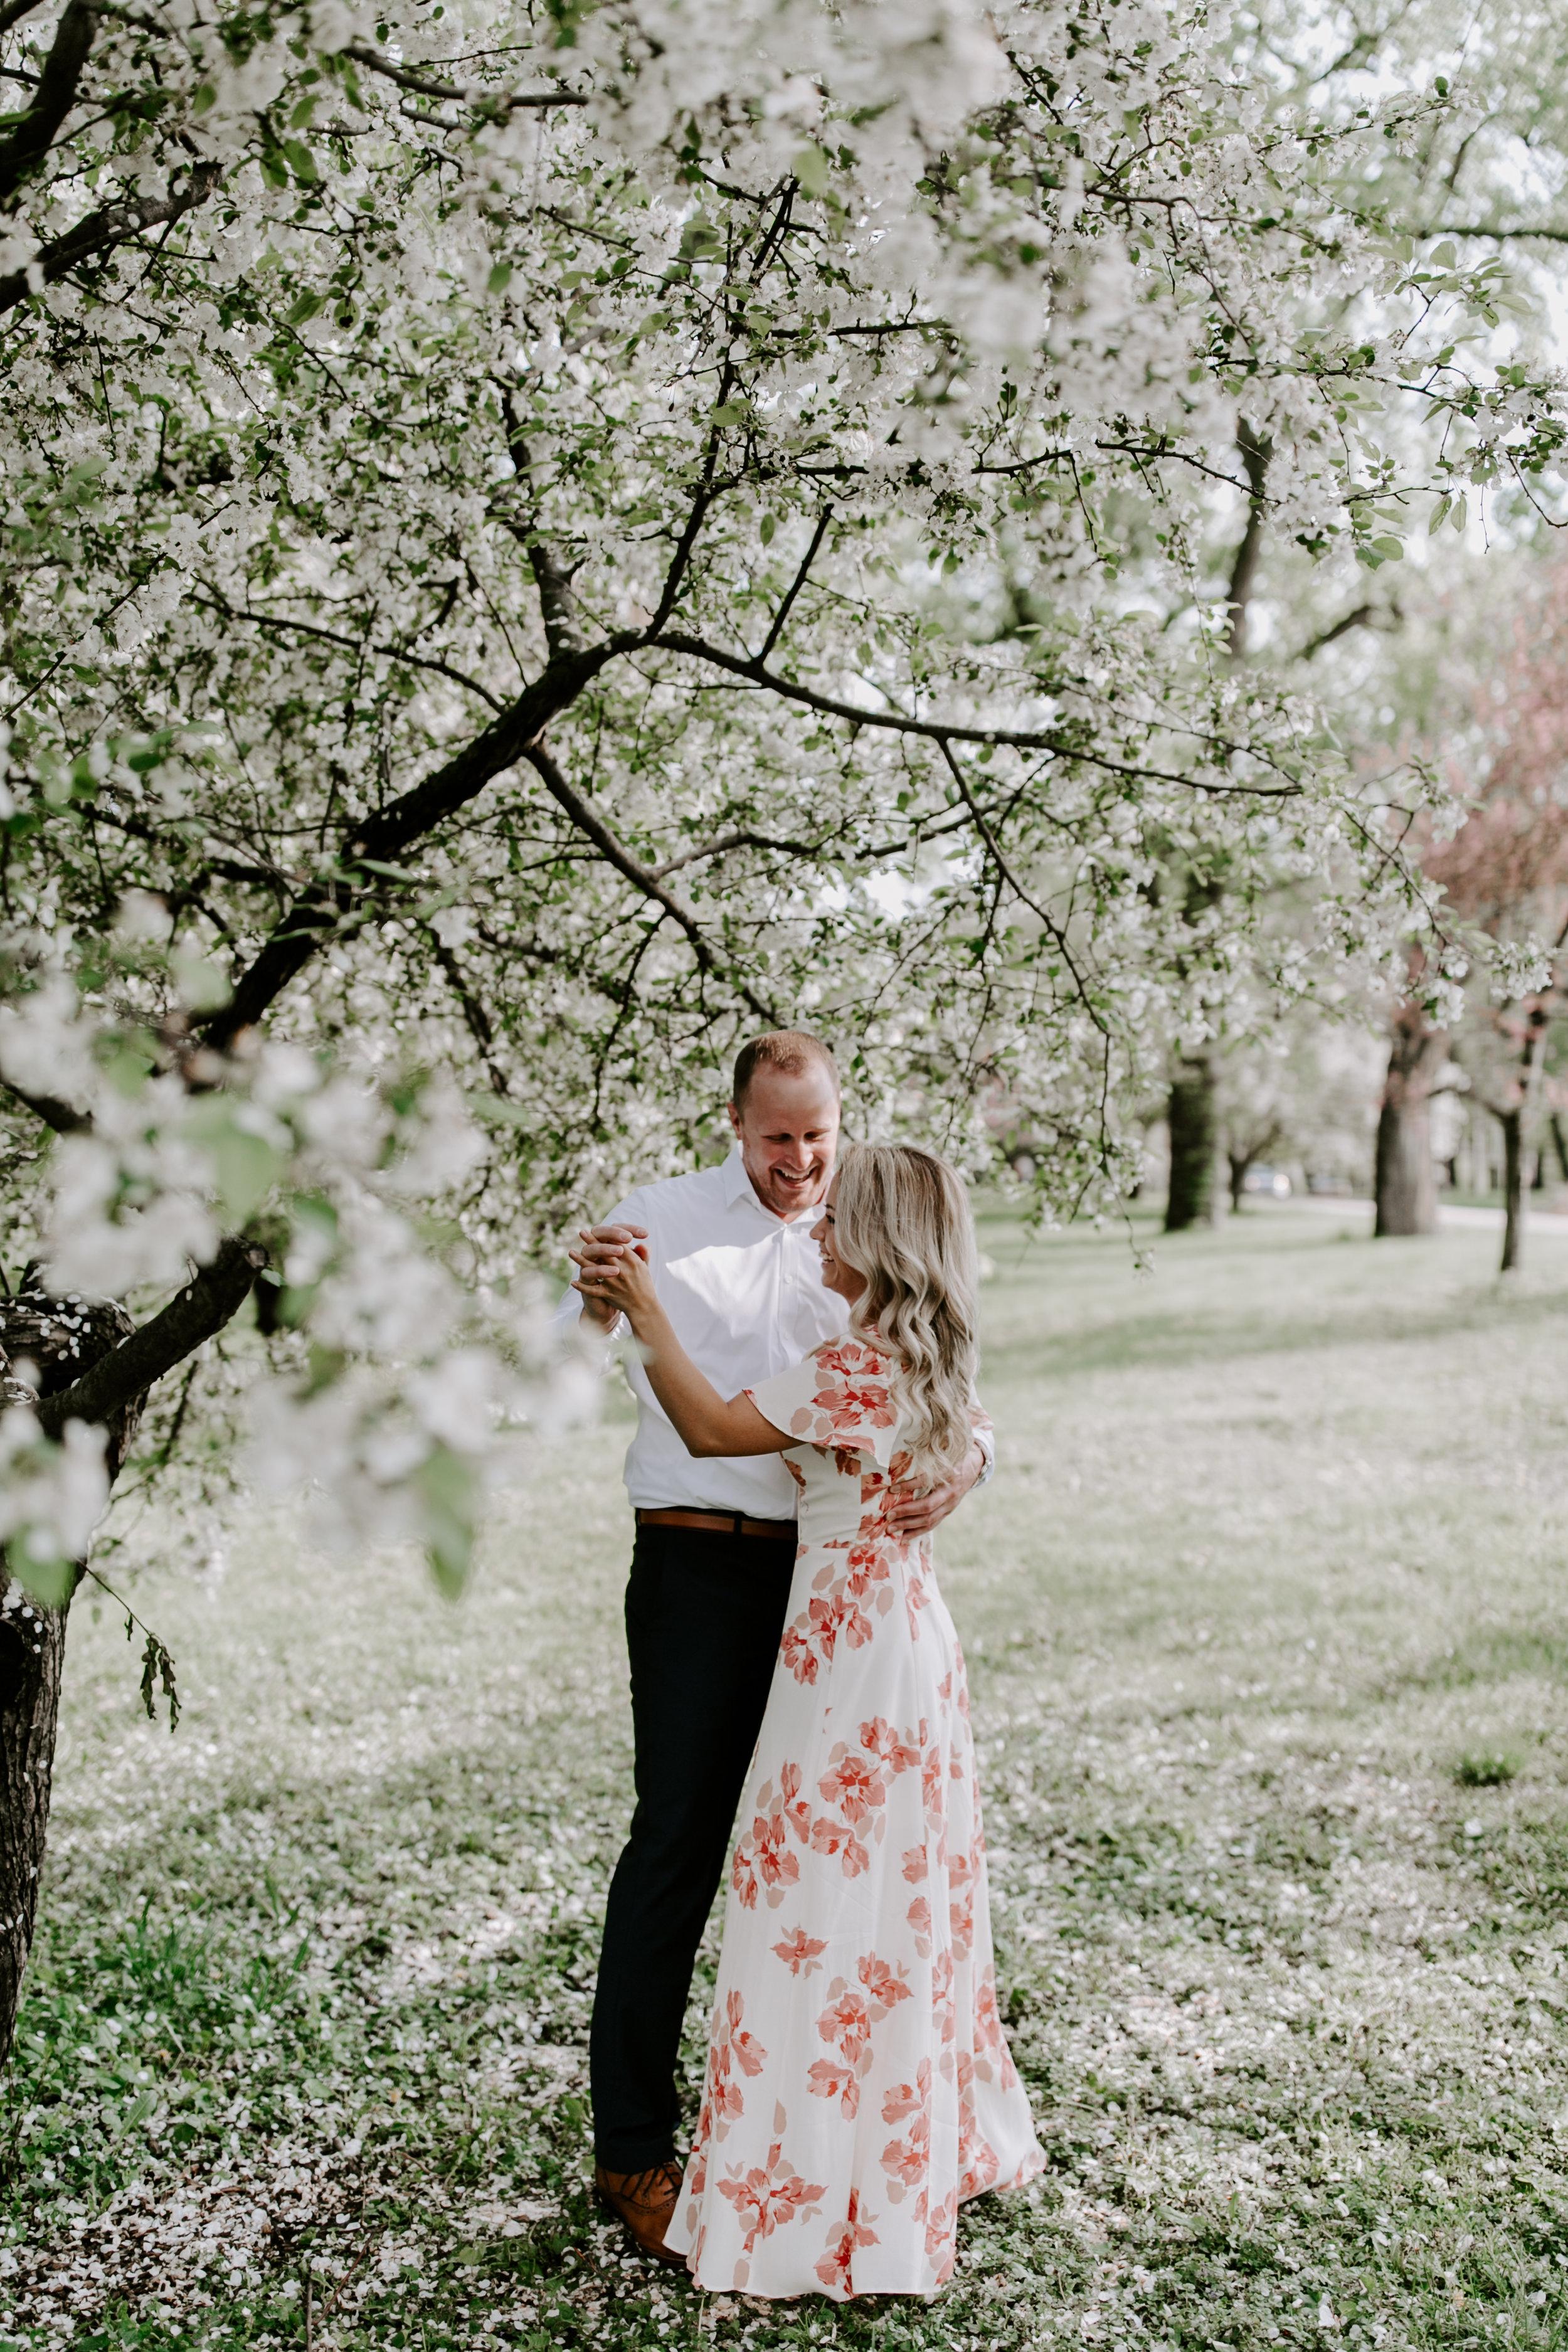 gracetphotography-wedding-photographer-adventure-bride-engagement-midwest-4.jpg